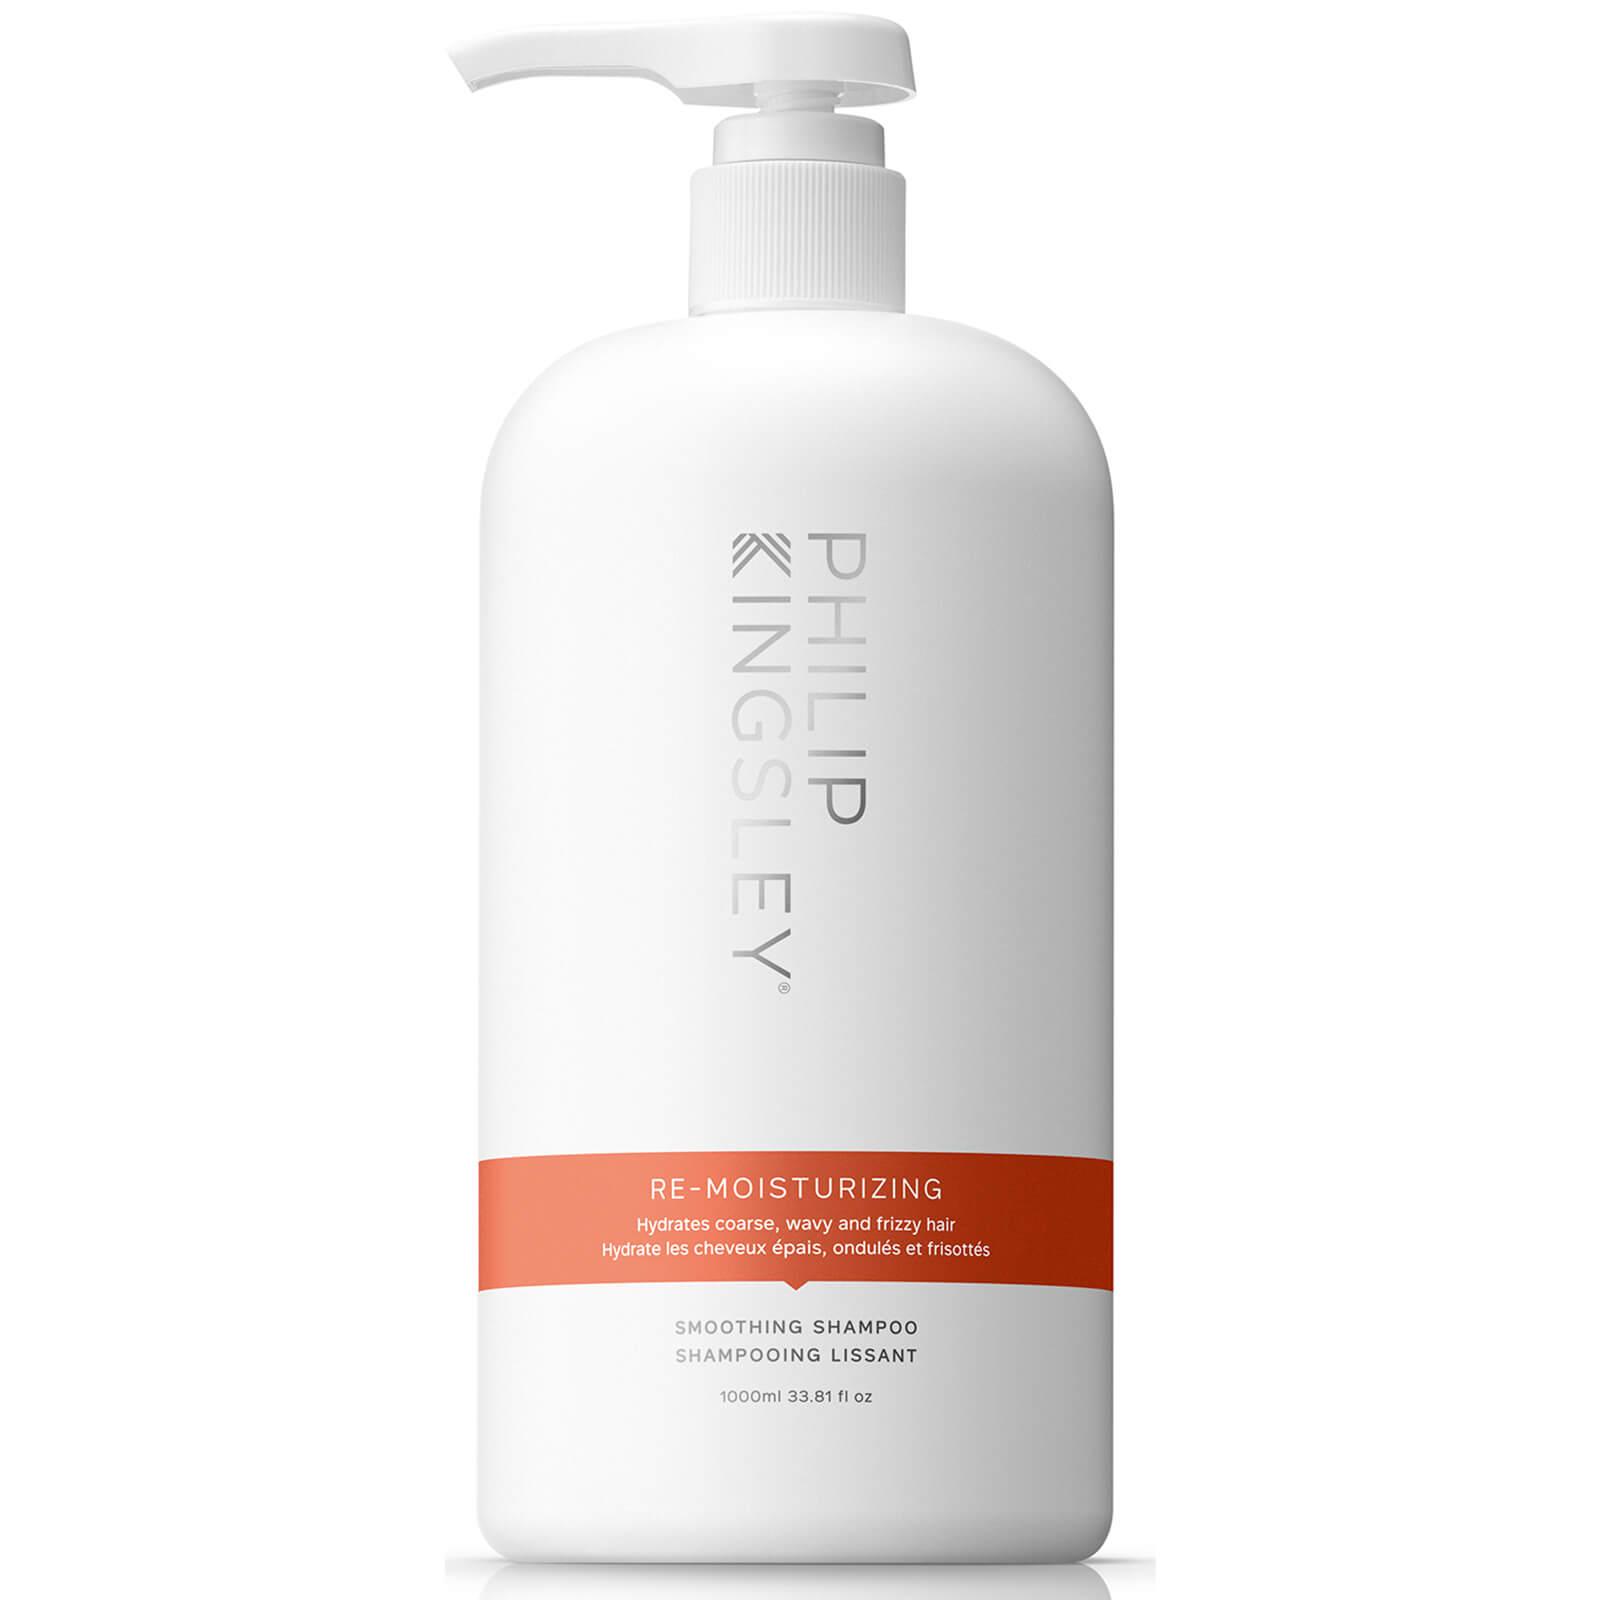 Купить Philip Kingsley Re-Moisturizing Smoothing Shampoo 1000ml